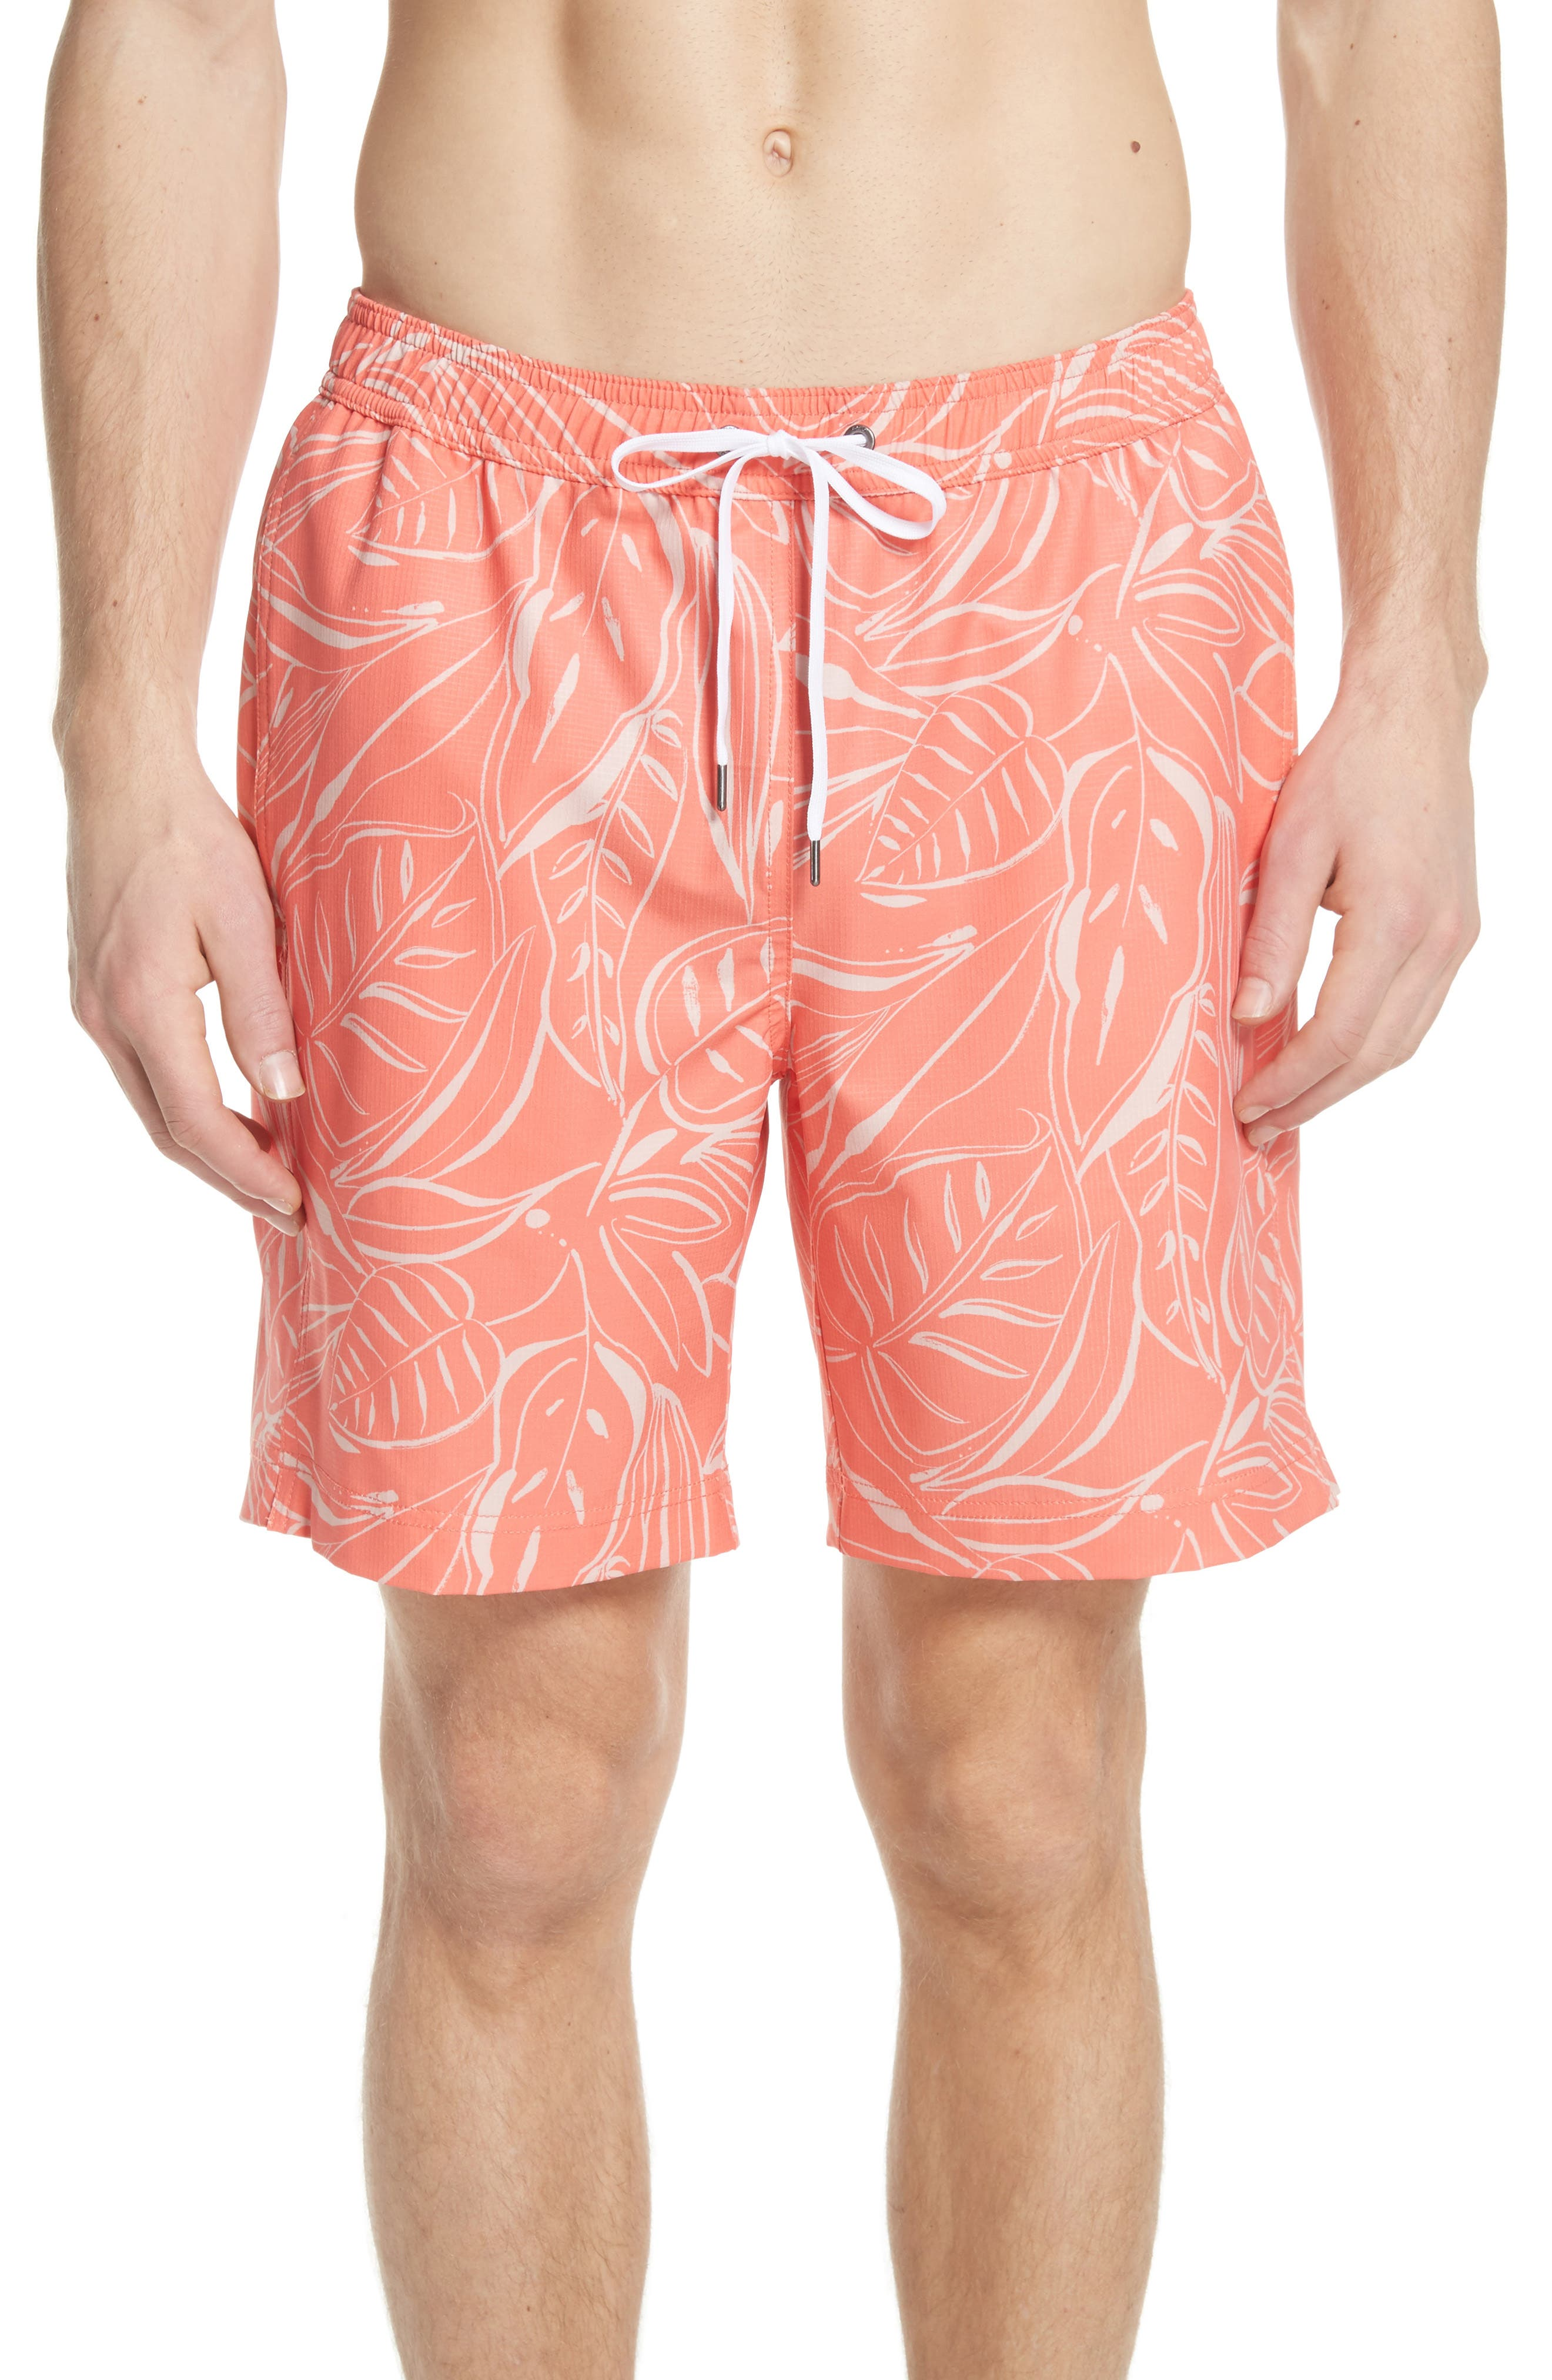 Charles Leaf Print Swim Trunks,                             Main thumbnail 1, color,                             Tangerine Coral